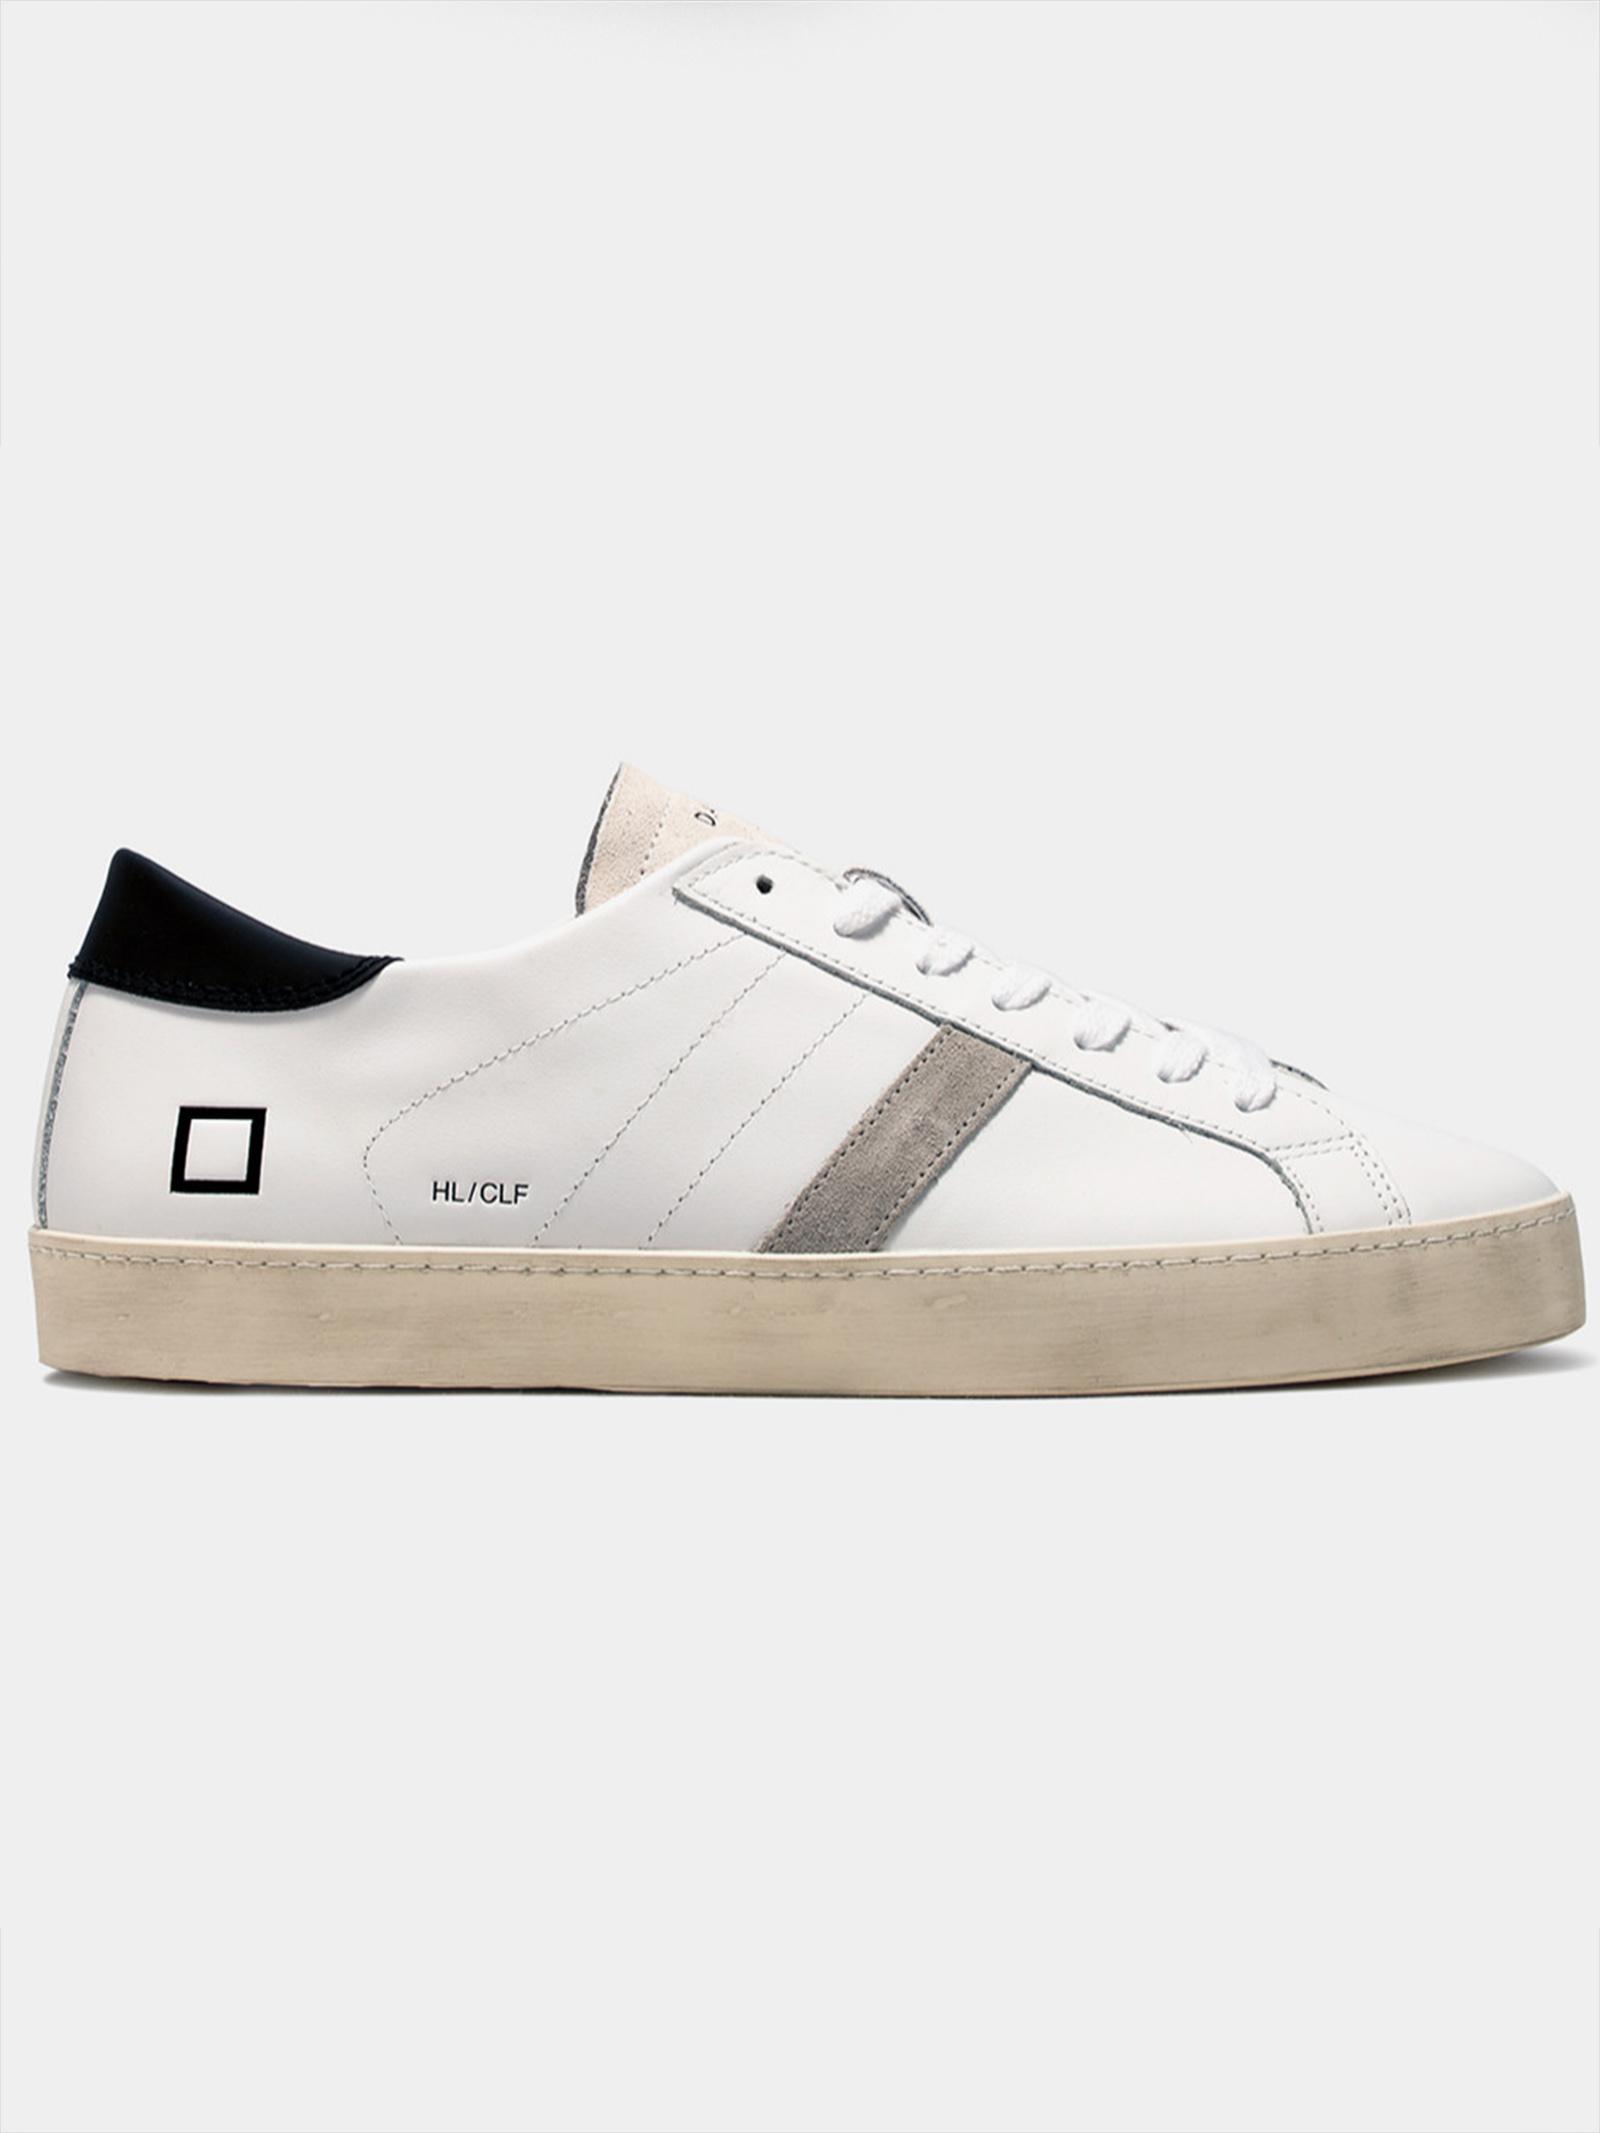 HILL LOW CALF WHITE-BLACK D.A.T.E.   Sneakers   M351-HL-CAWB